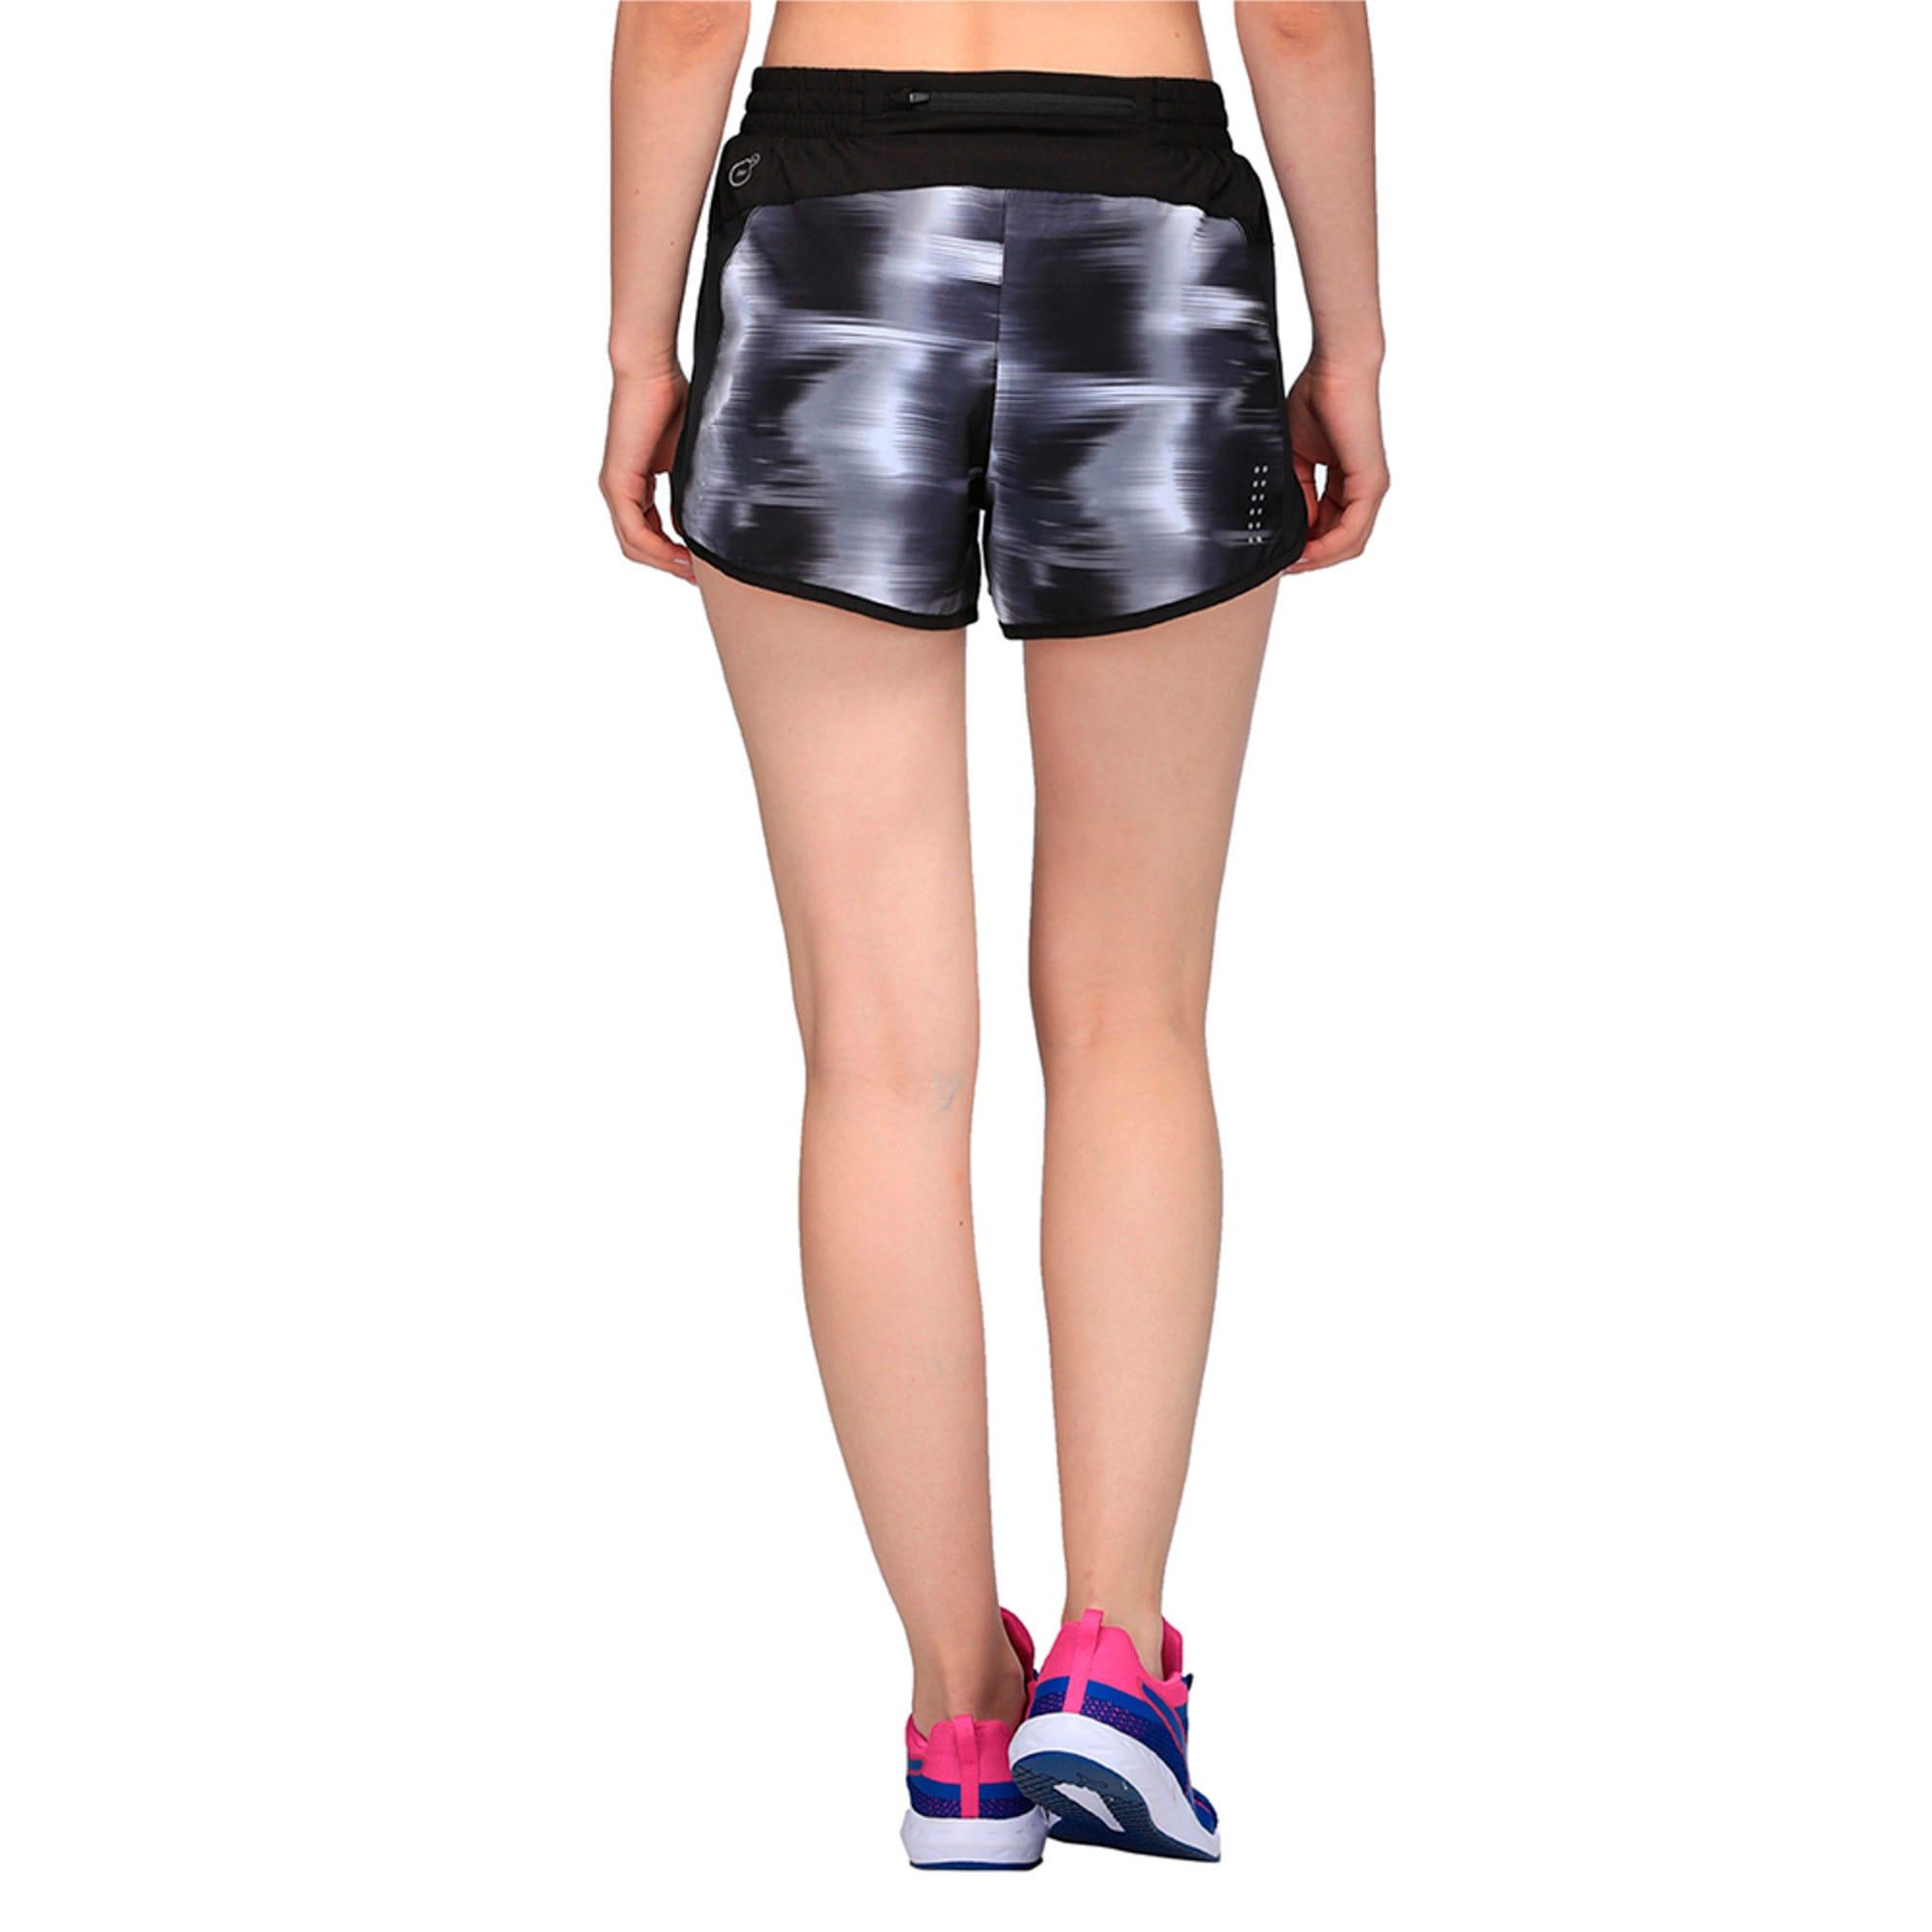 Thumbnail 3 of Running Women's Blast Graphic Shorts, Puma Black-Shell Black AOP, medium-IND